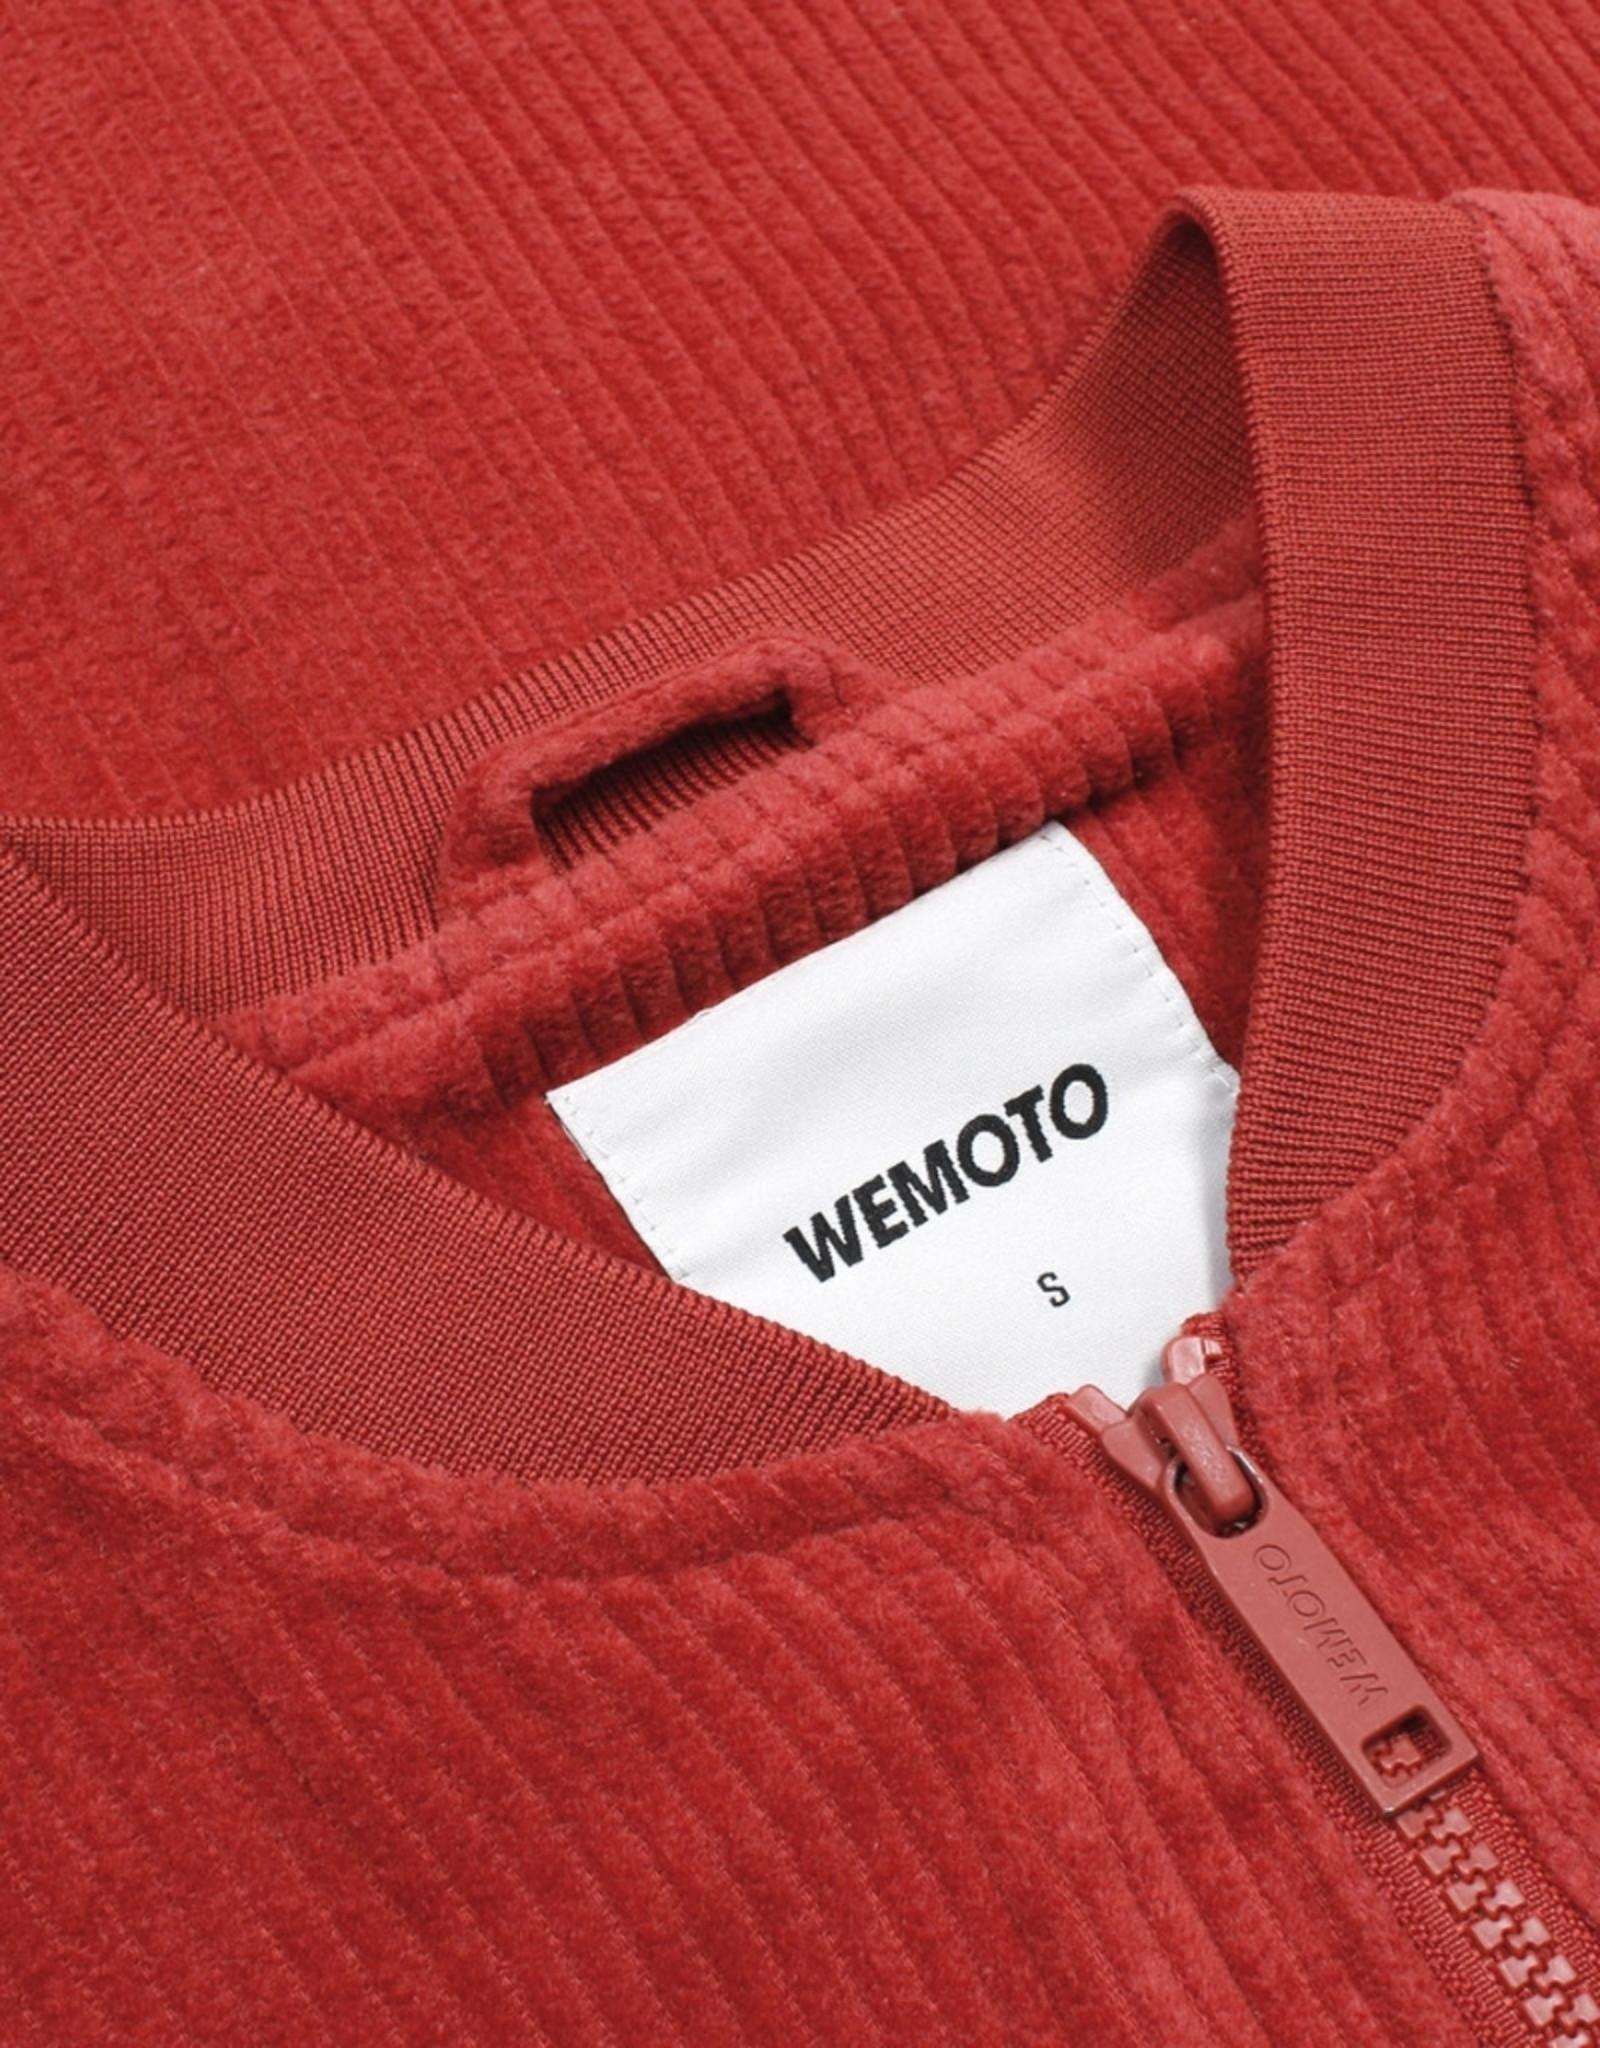 Wemoto - SMILLA